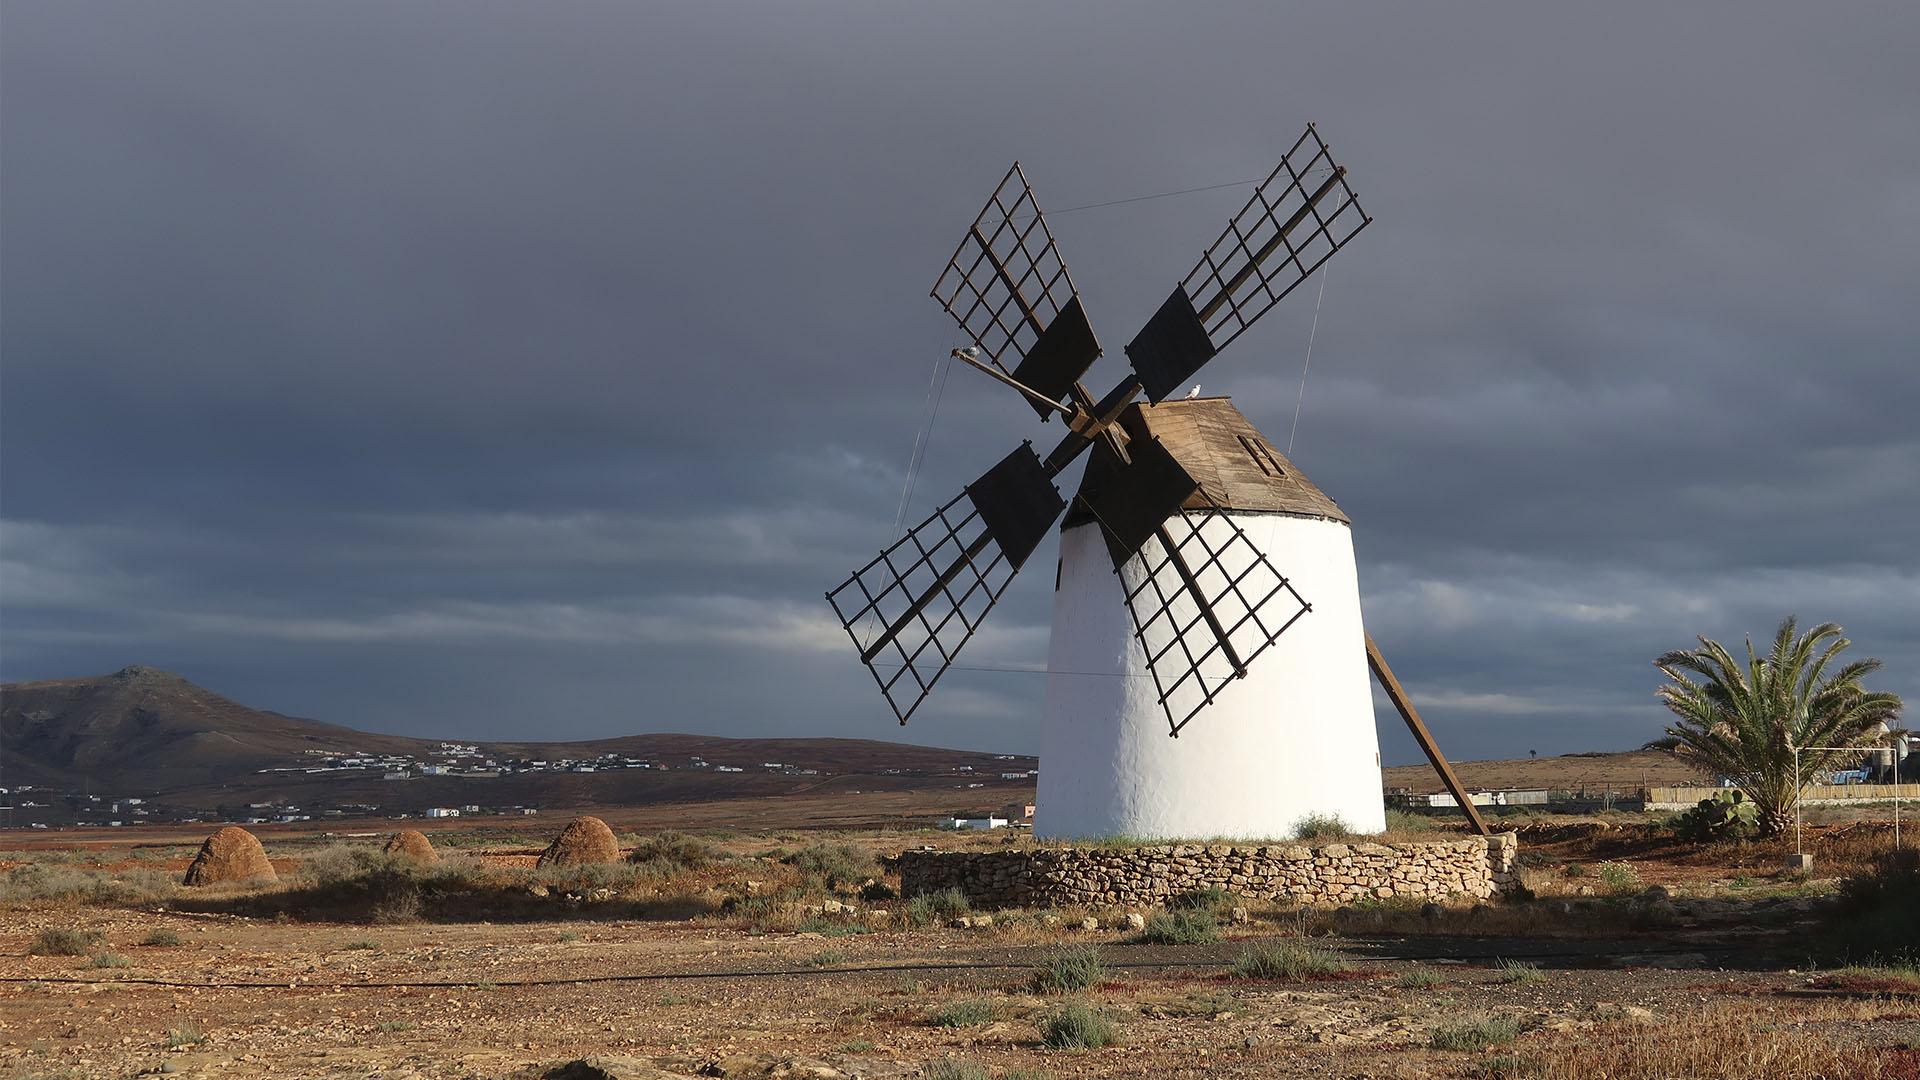 Windmühle Valle de Santa Inés Fuerteventura.